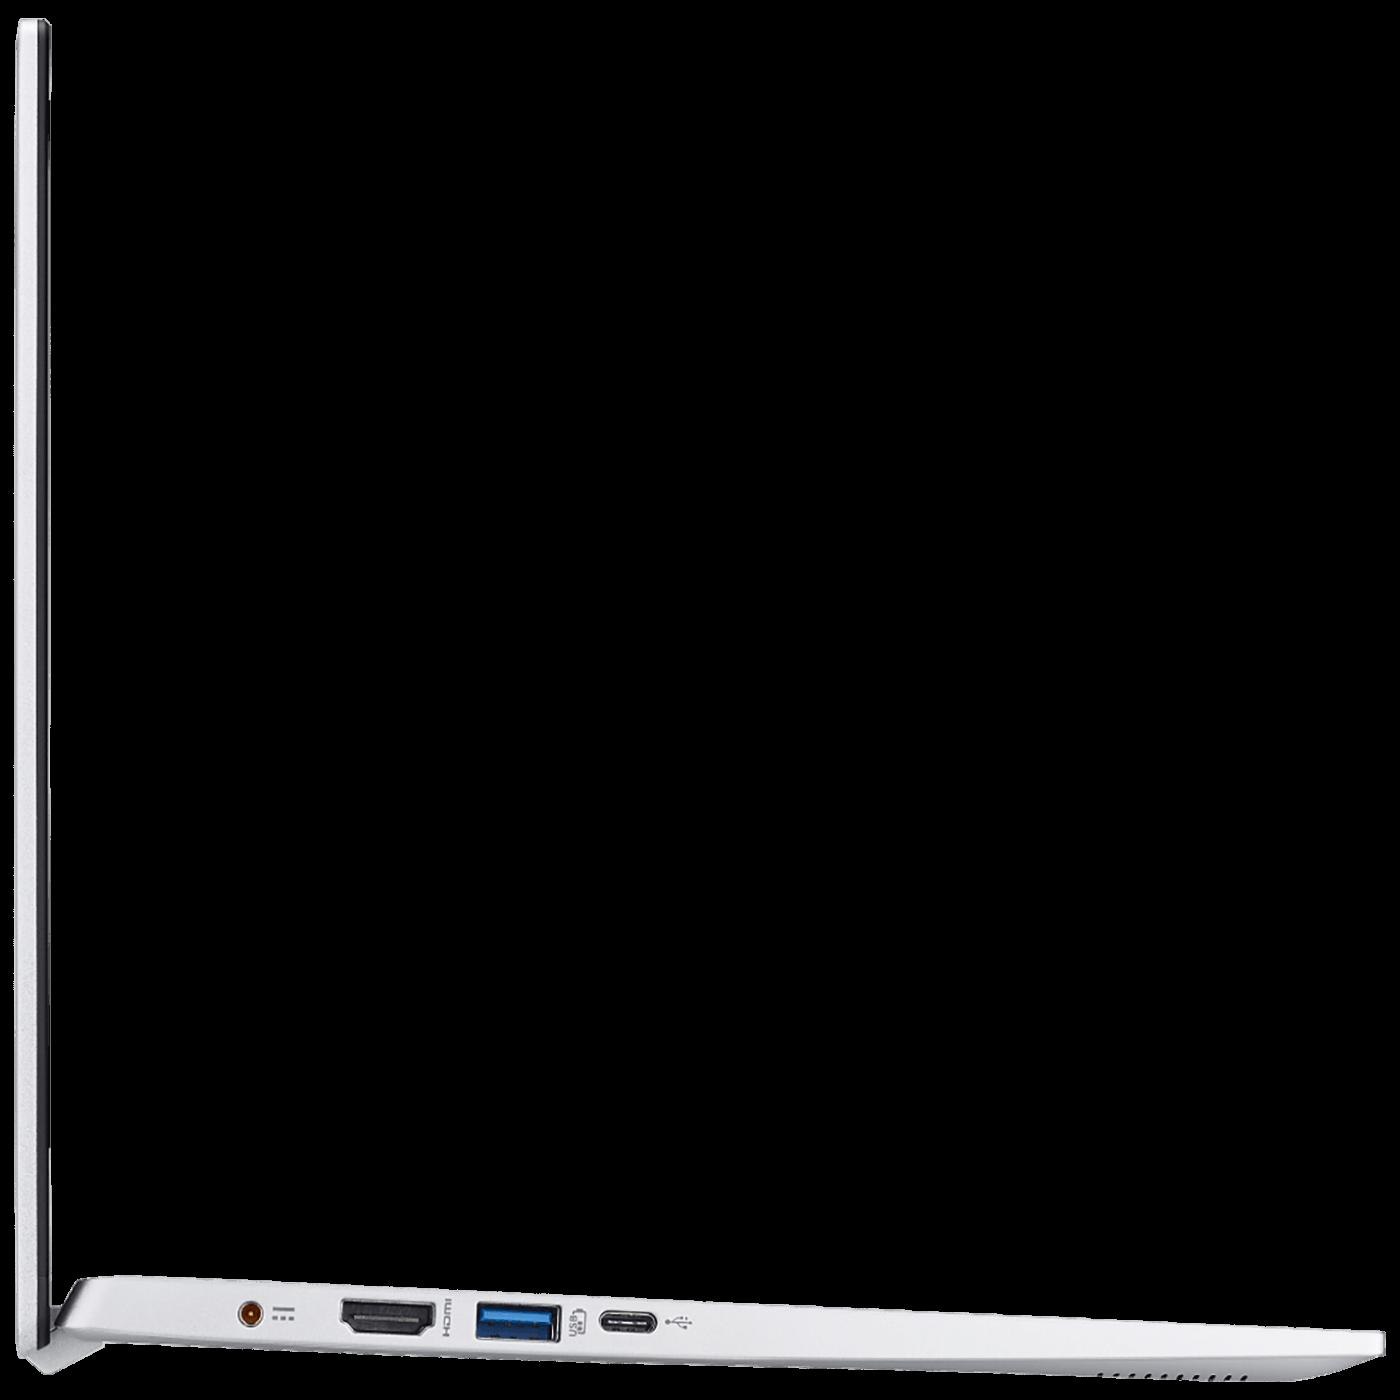 Swift 1 SF114-33;NX.HYSEX.00G